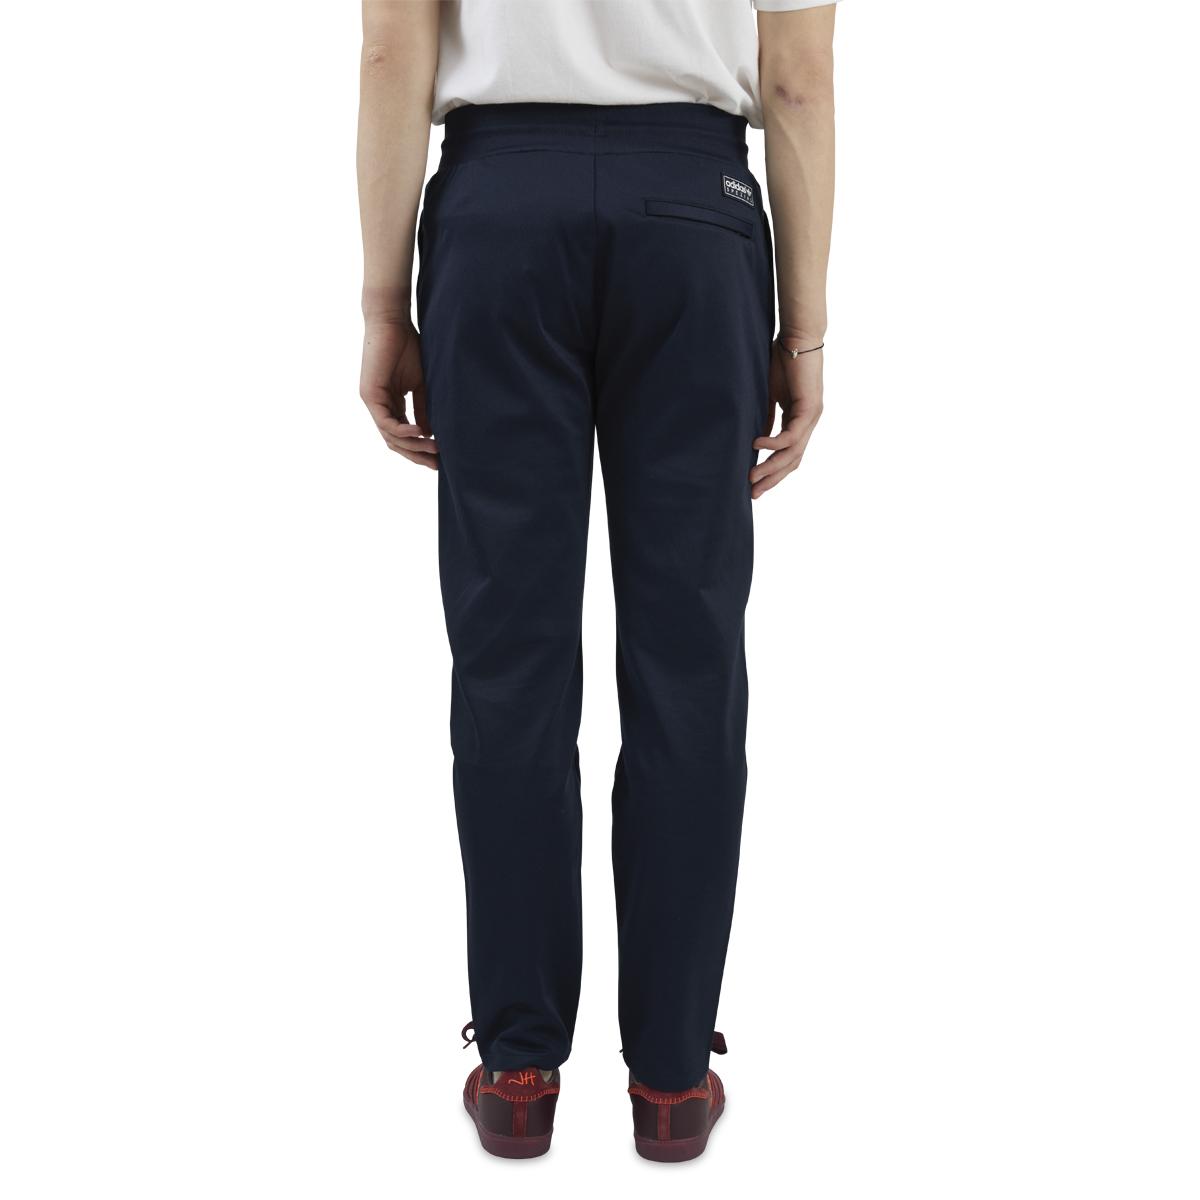 adidas SPZL Track Pants